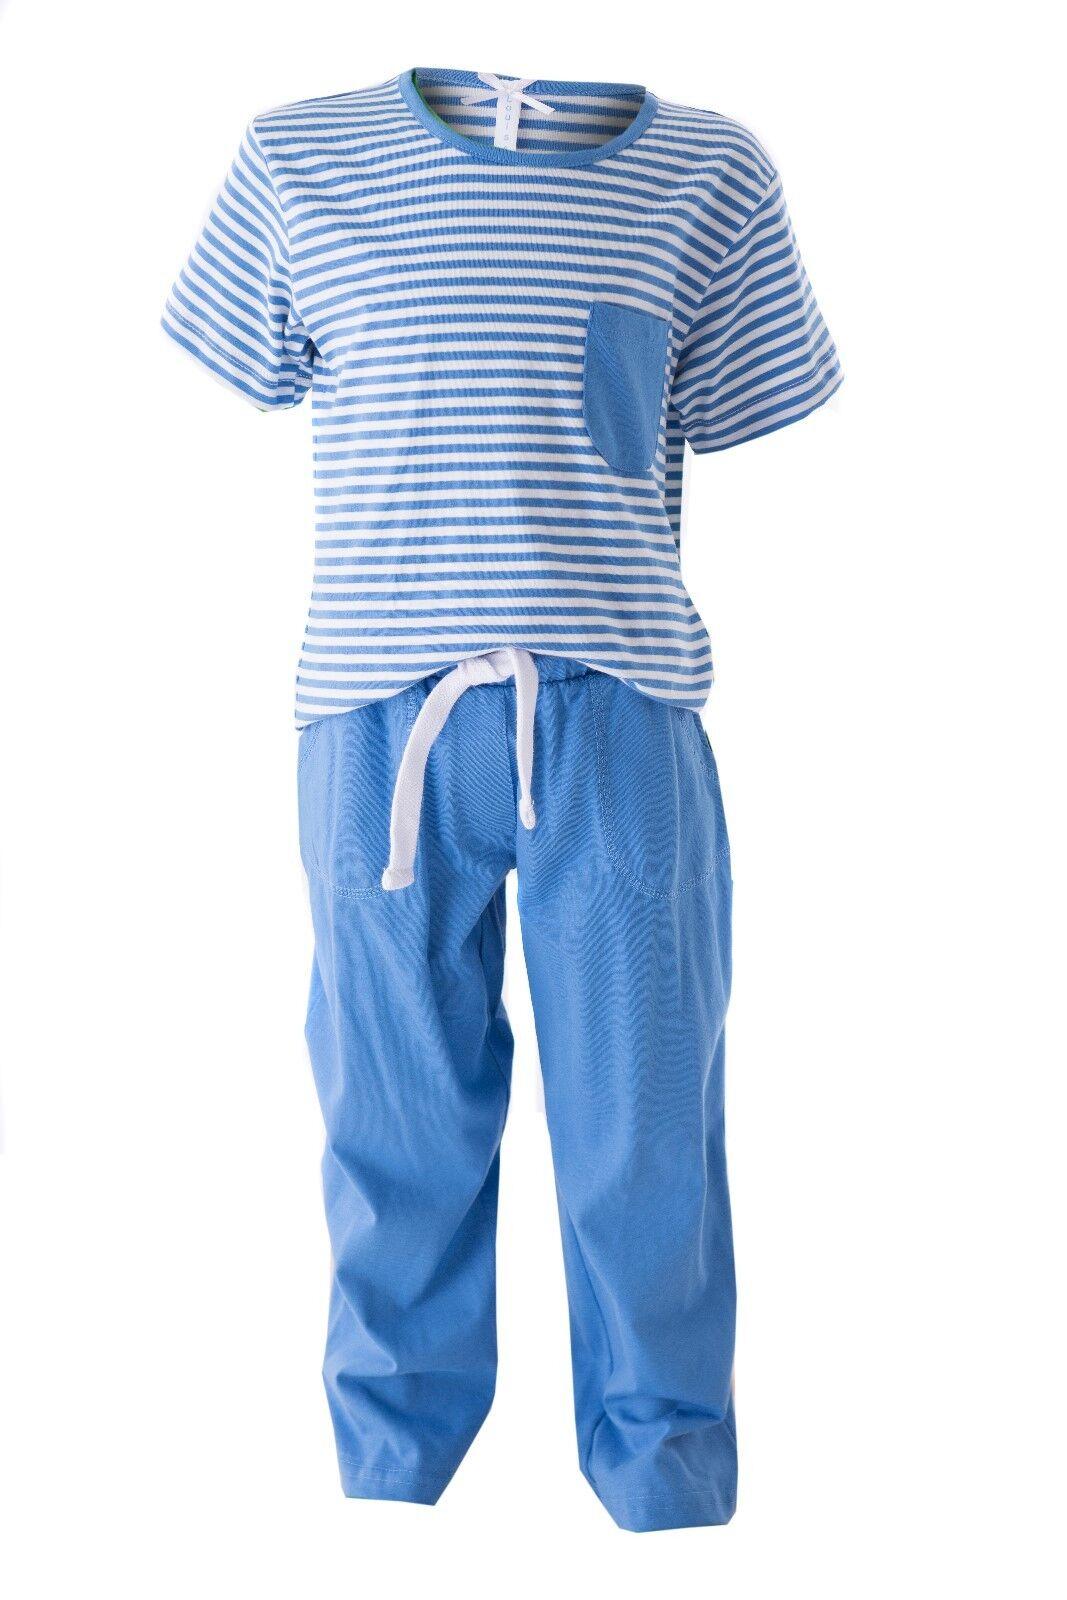 "LOUIS & LOUISA "" Auf Traumreise "" Pyjama blau gestreift Gr. 92 - 164 NEU"